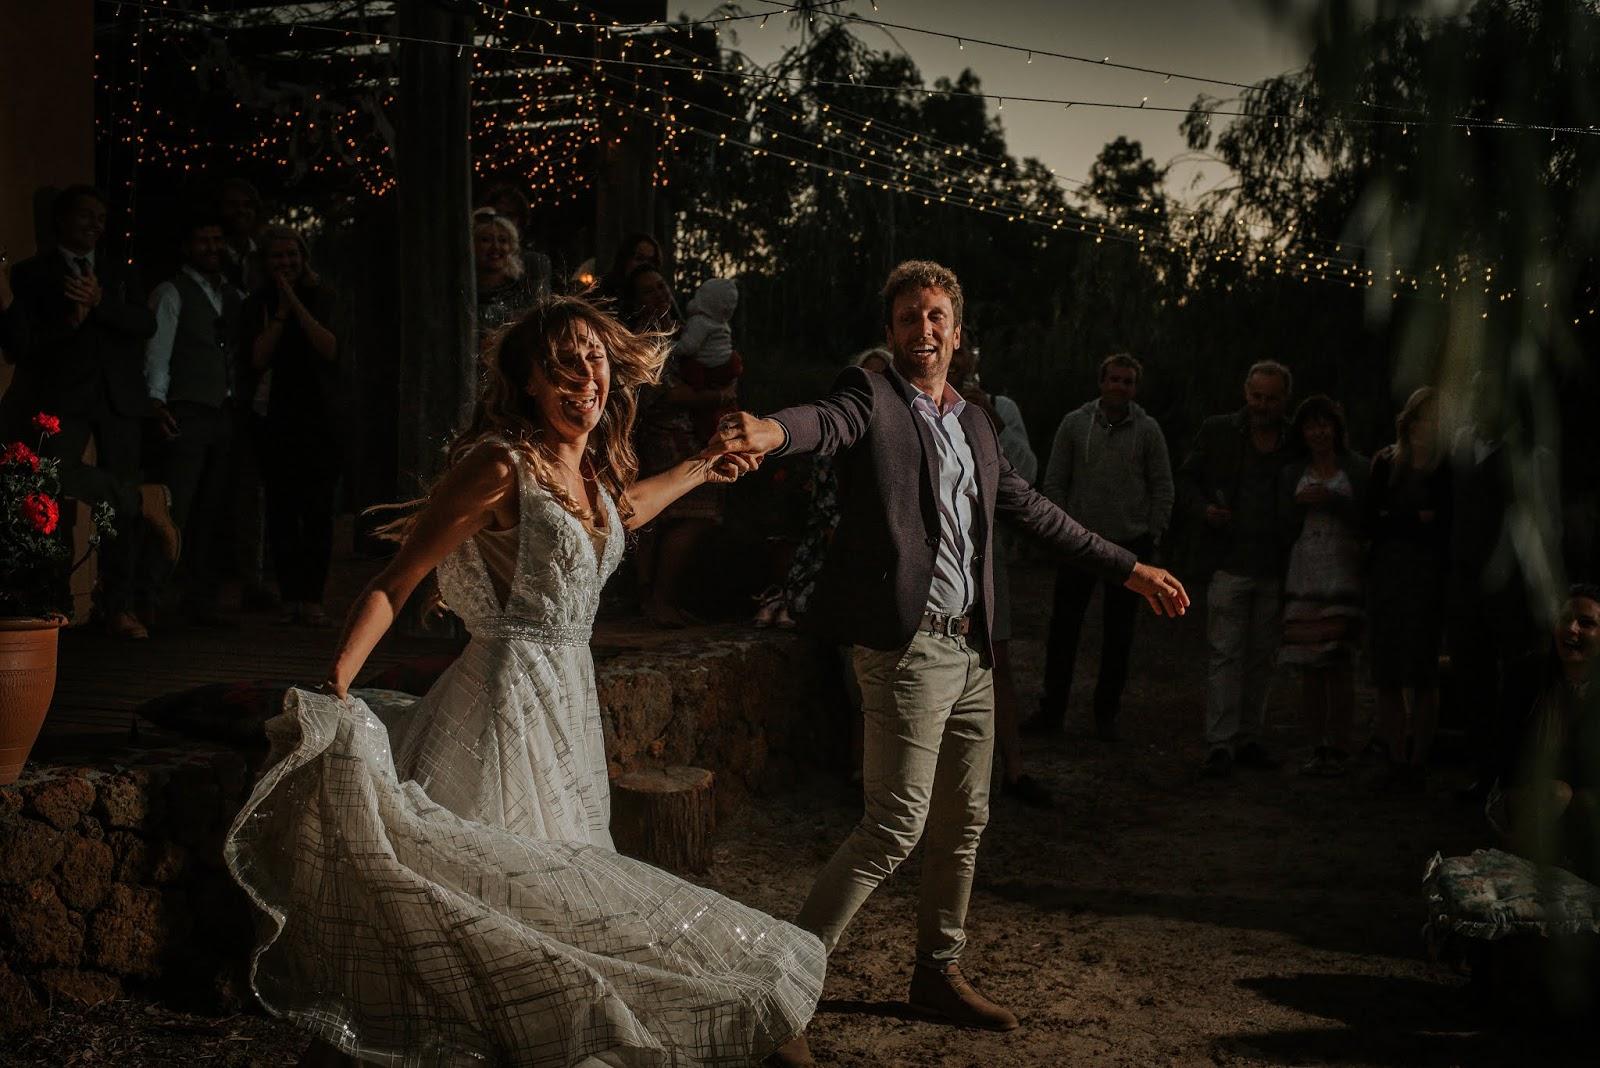 DIY MARGARET RIVER WEDDINGS PERTH MILA + JESSE